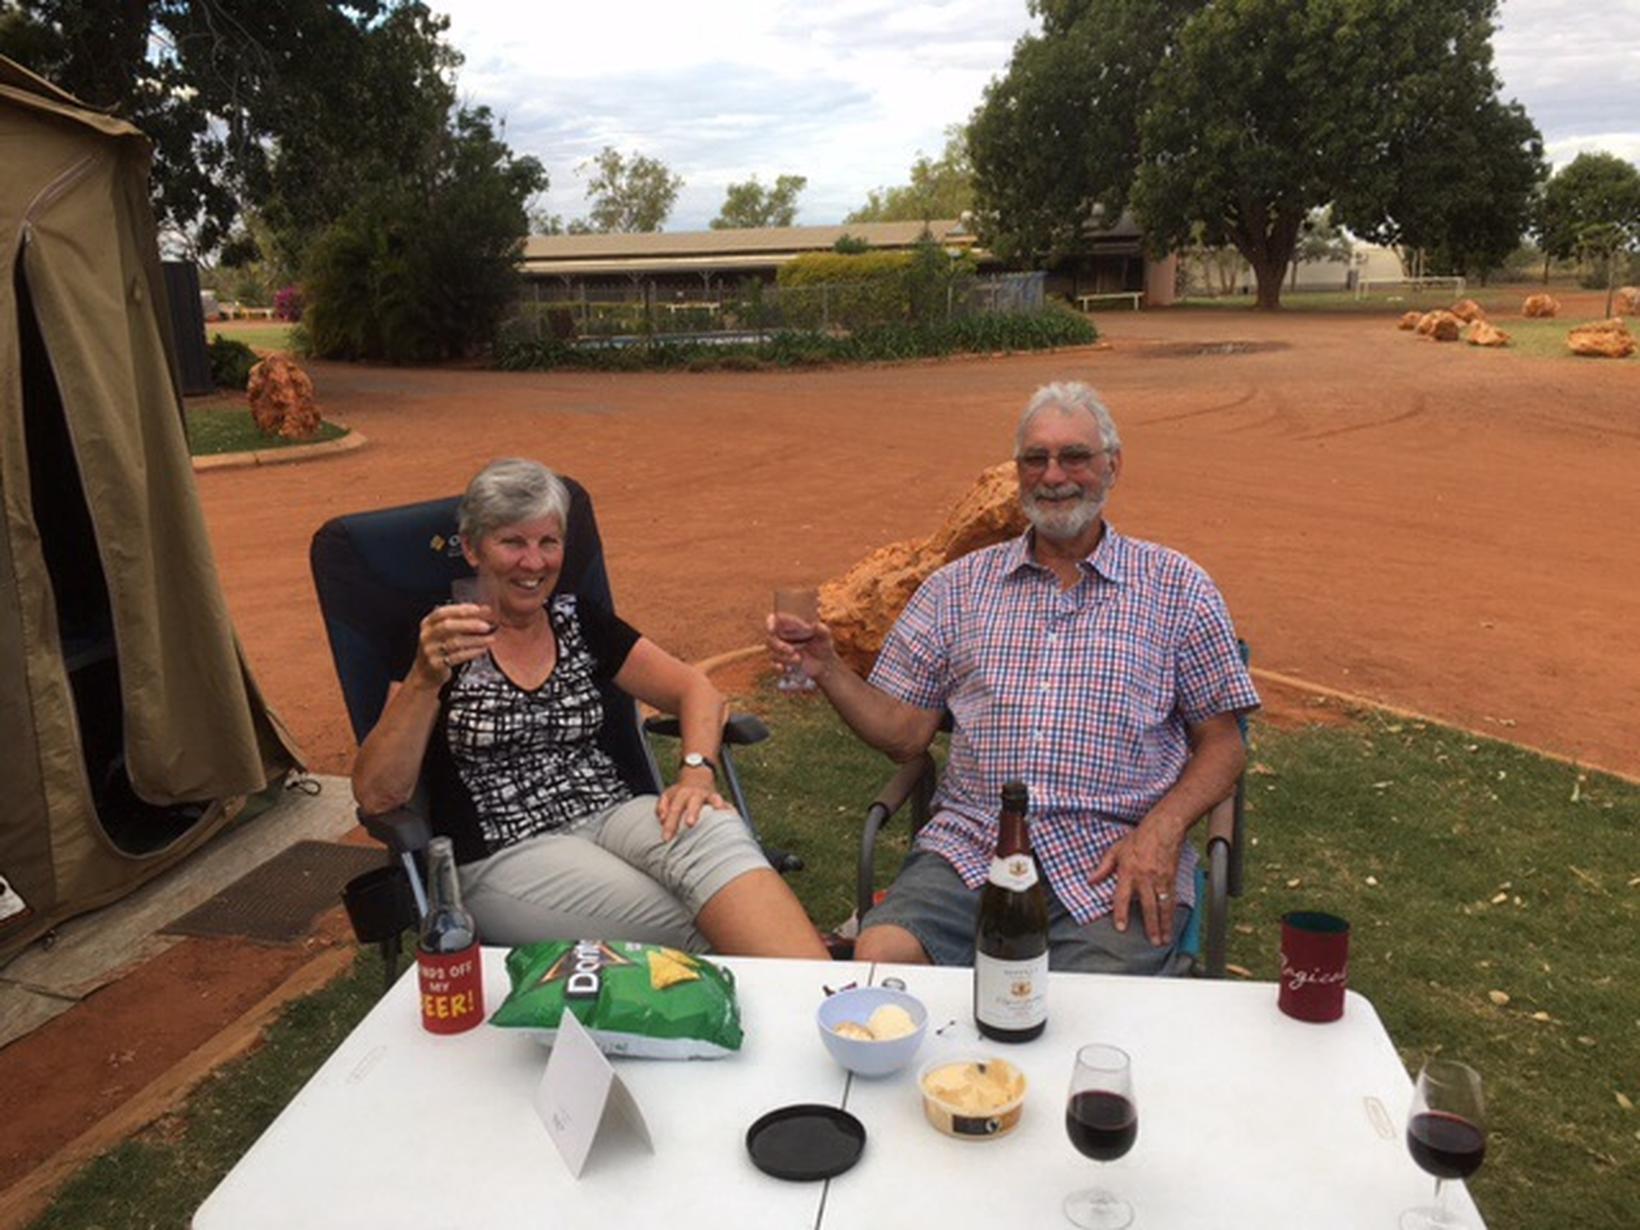 Libby & Reg from Stawell, Victoria, Australia